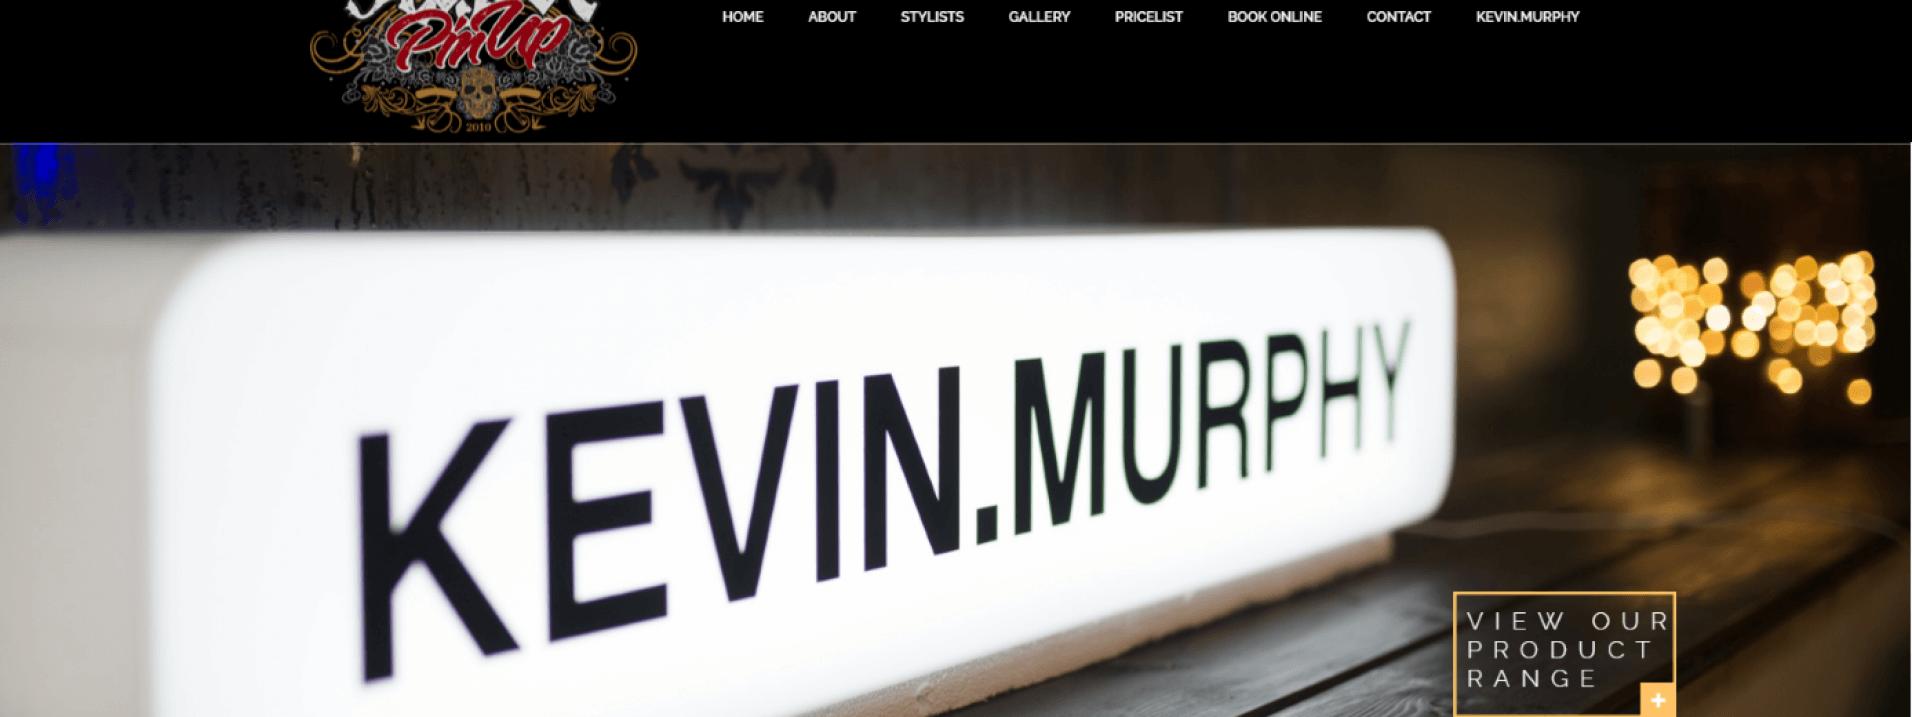 web design company in leeds